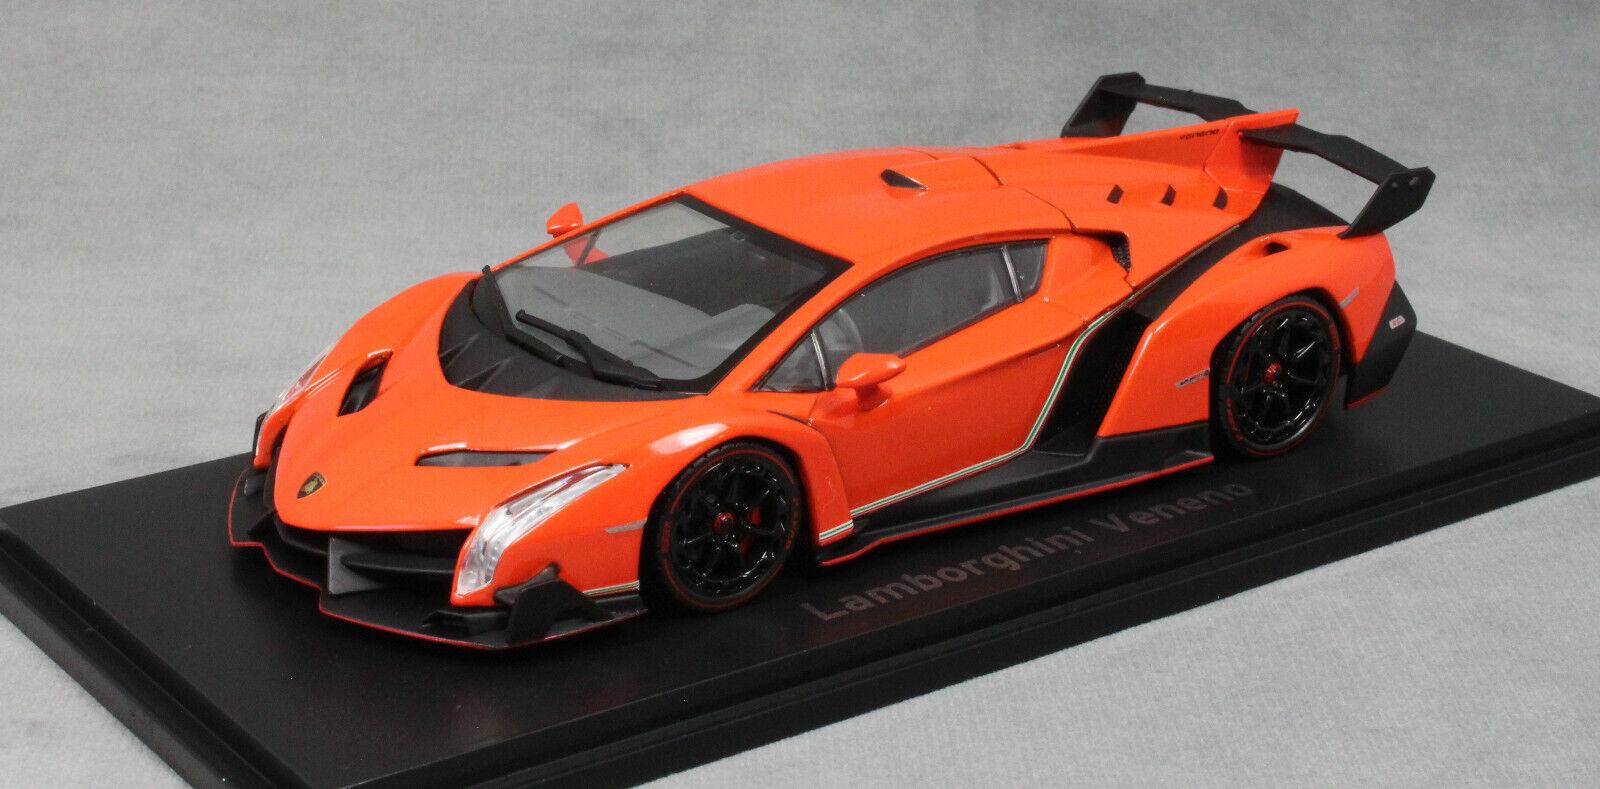 Kyosho Lamborghini Veneno in orange 2013 05571OR 1 43 43 43 NEW RRP .99 801050